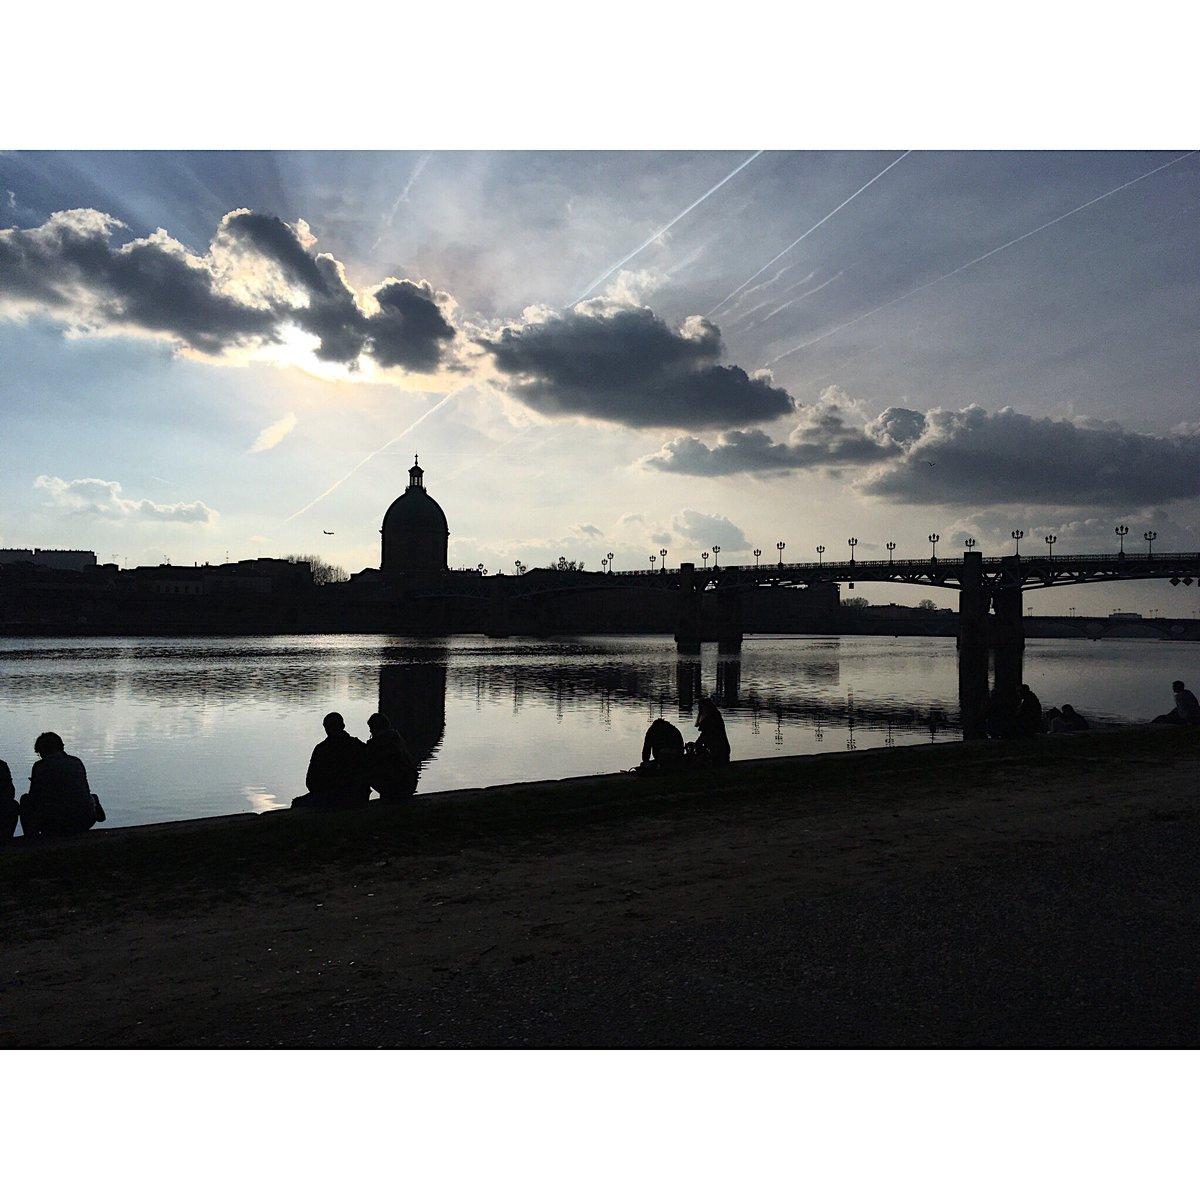 Sky art  #BattleCiel #Toulouse<br>http://pic.twitter.com/DsHCn4G6i4